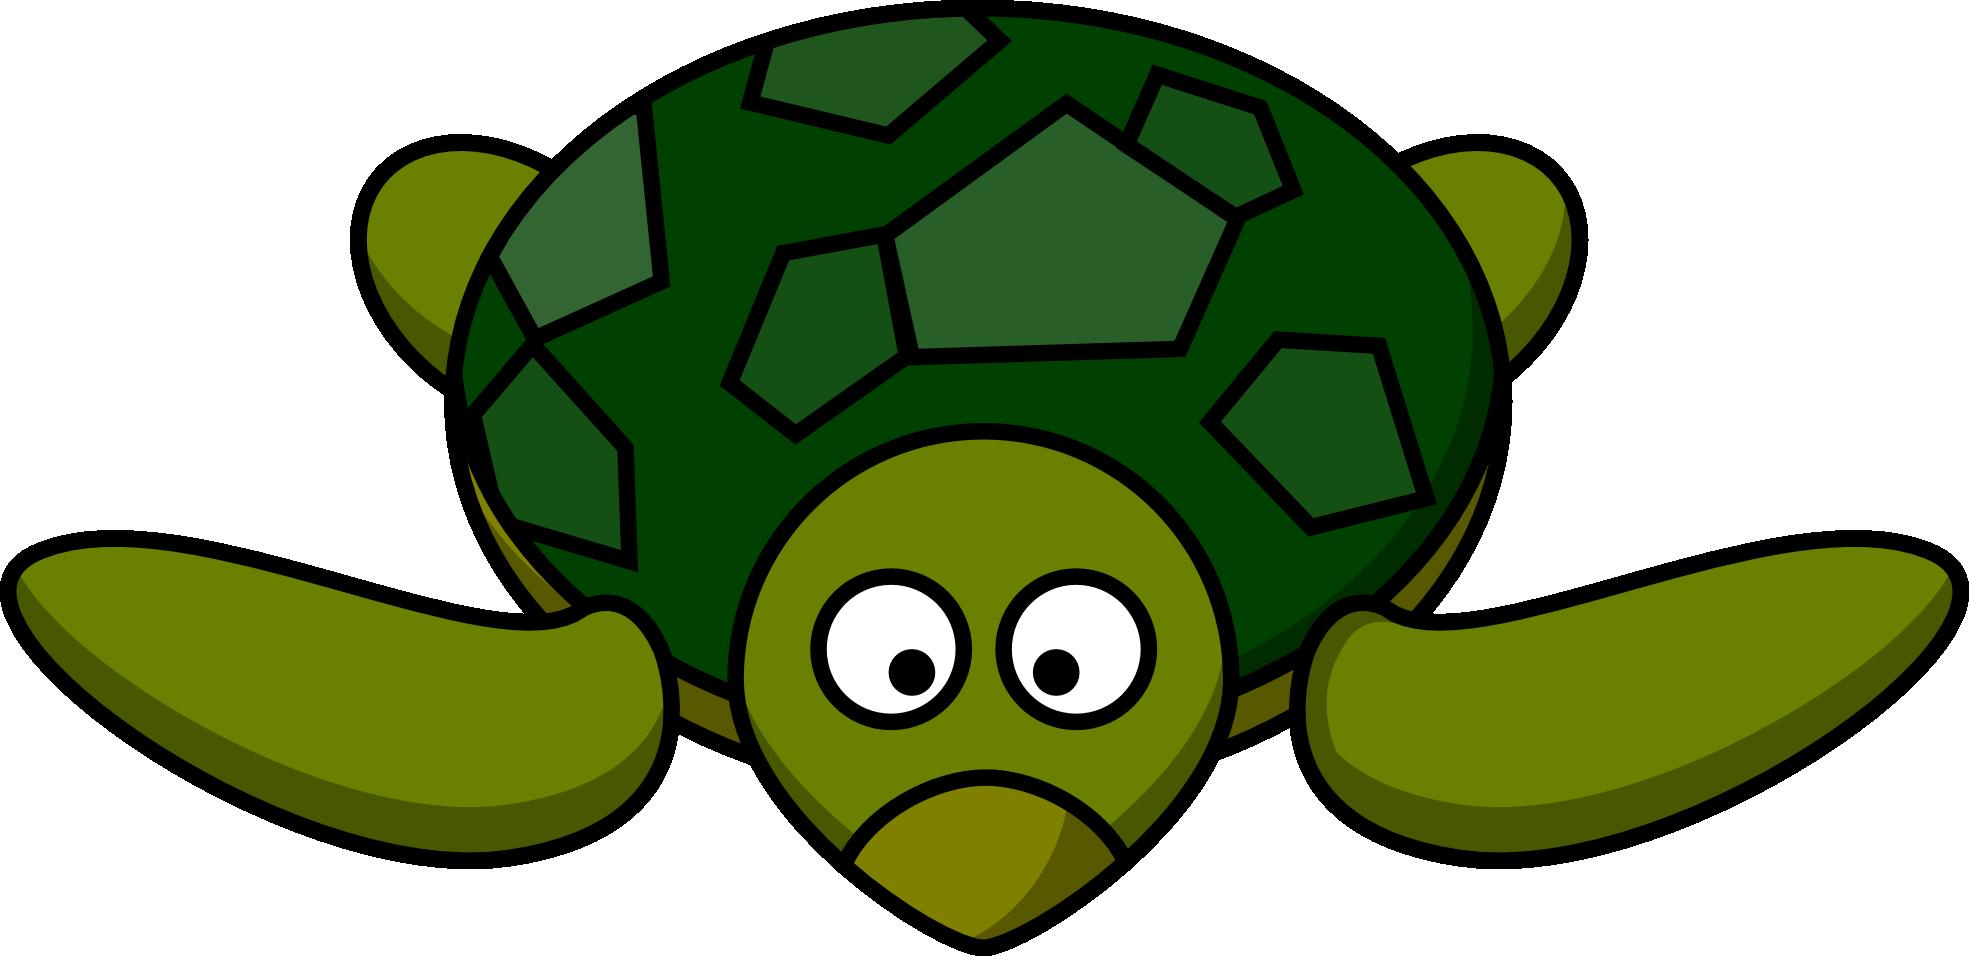 Clipart face tortoise. Cartoon turtles free winter